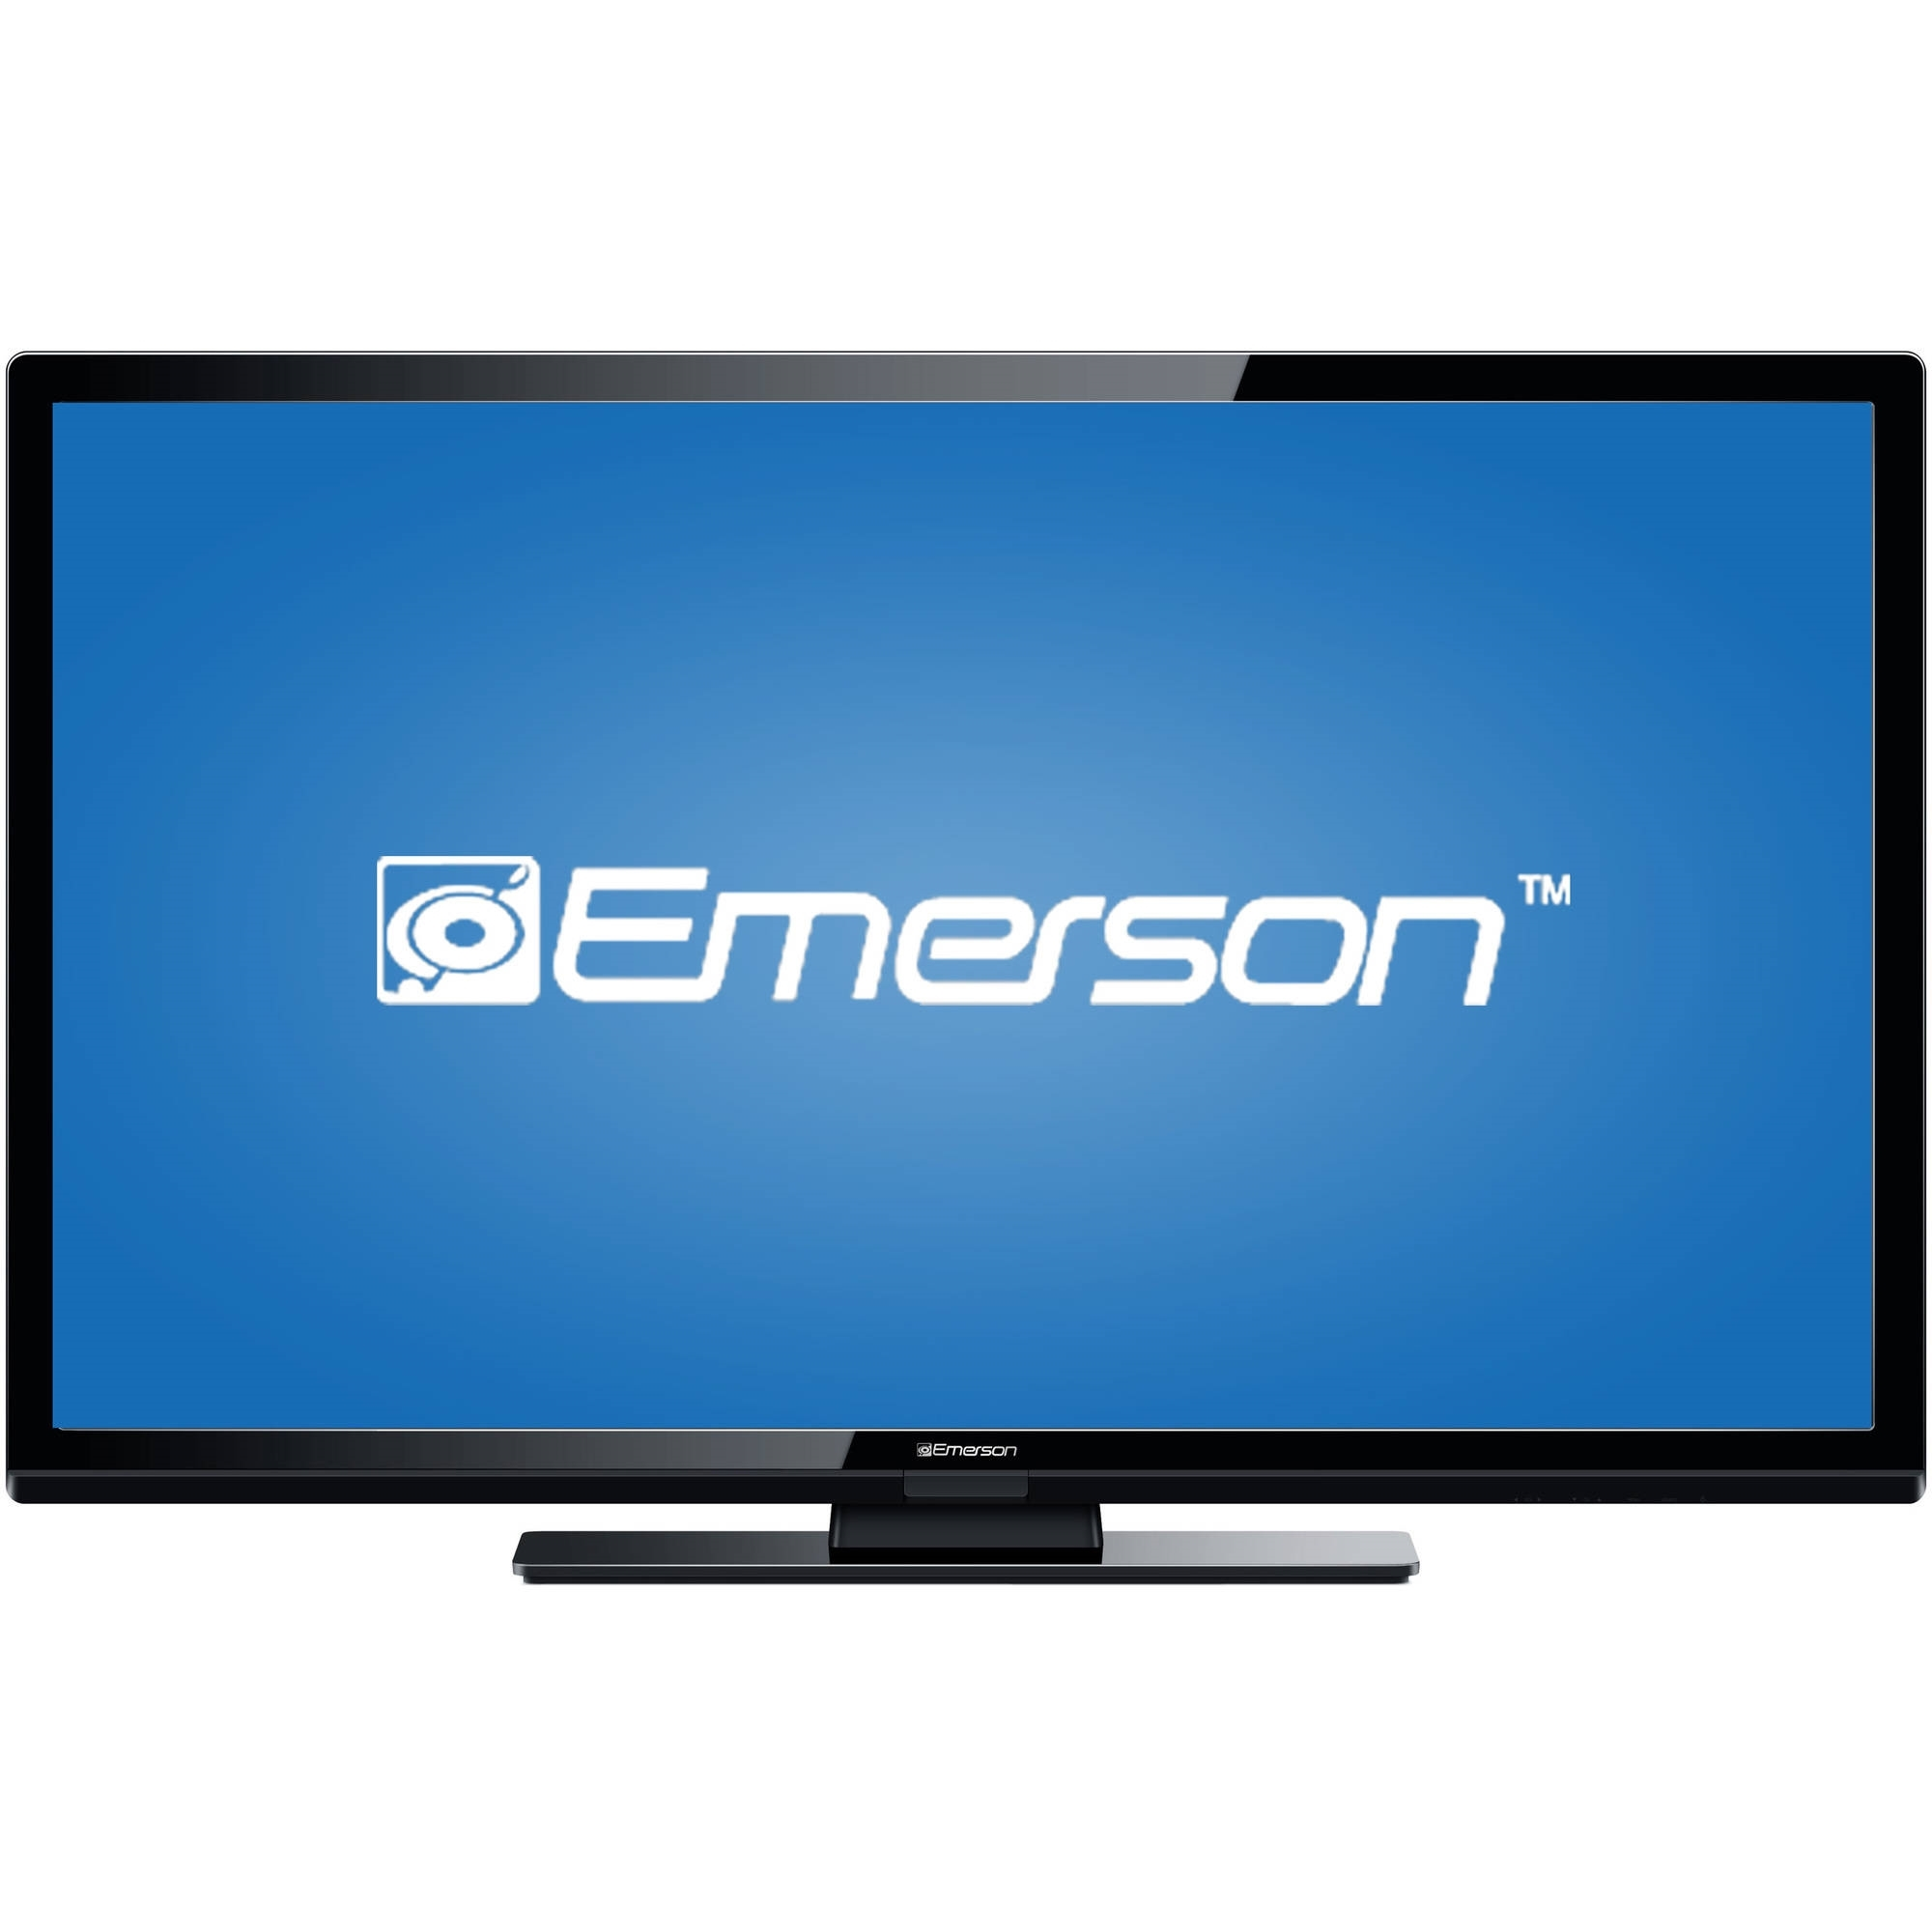 "Emerson LF501EM6F 1080p 50"" LED TV, Black (Certified Refurbished) by Emerson"